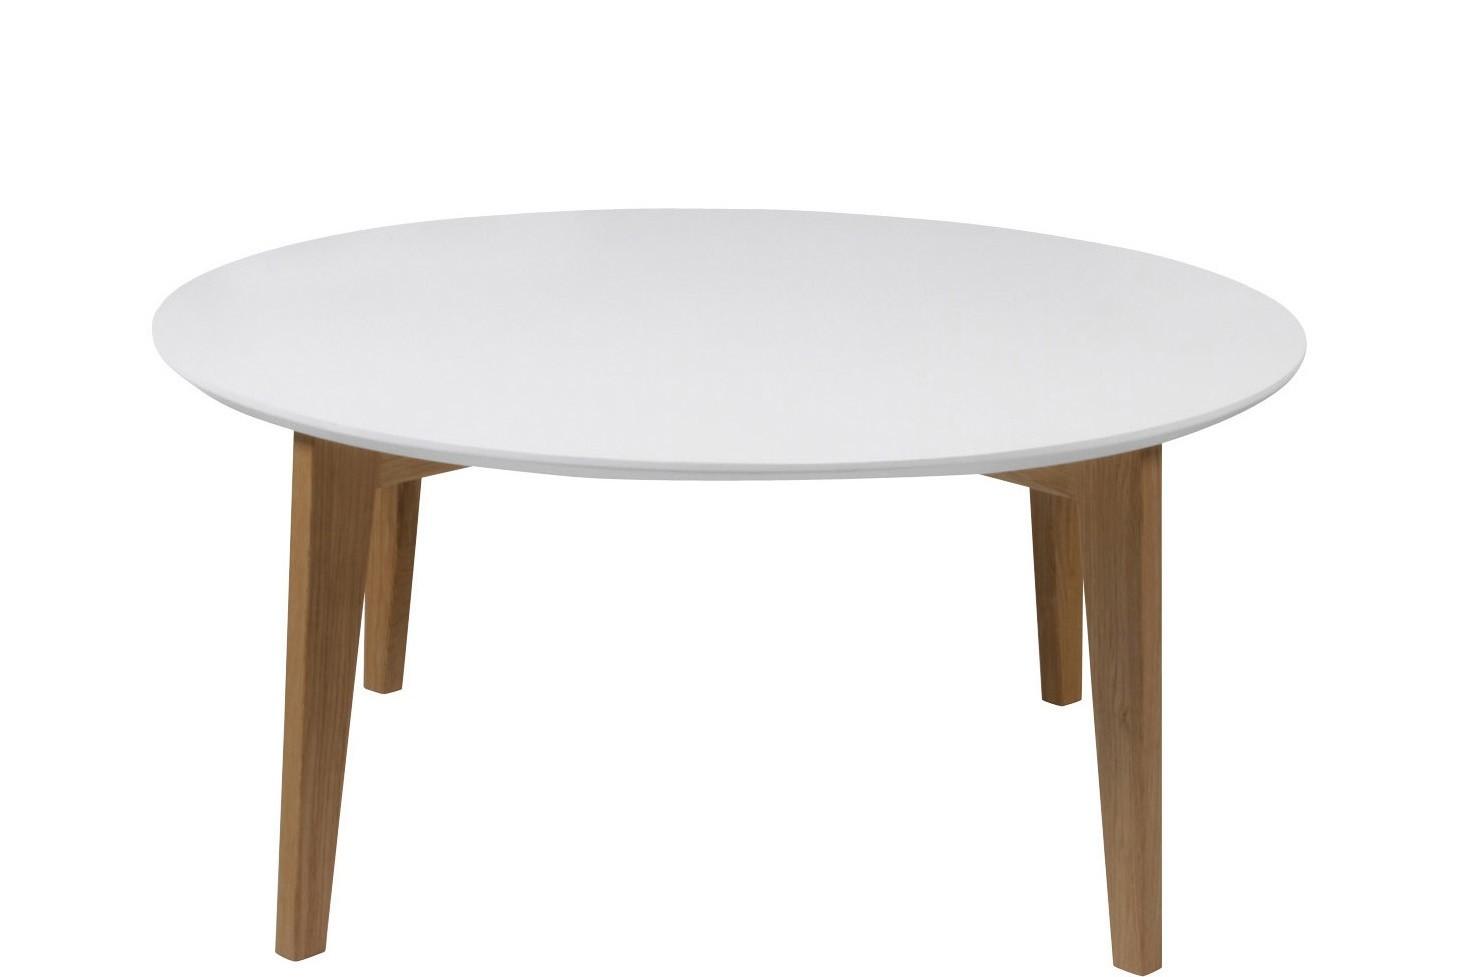 Salontafel Nodig? - PUUR Design & Interieur helpt je op weg!